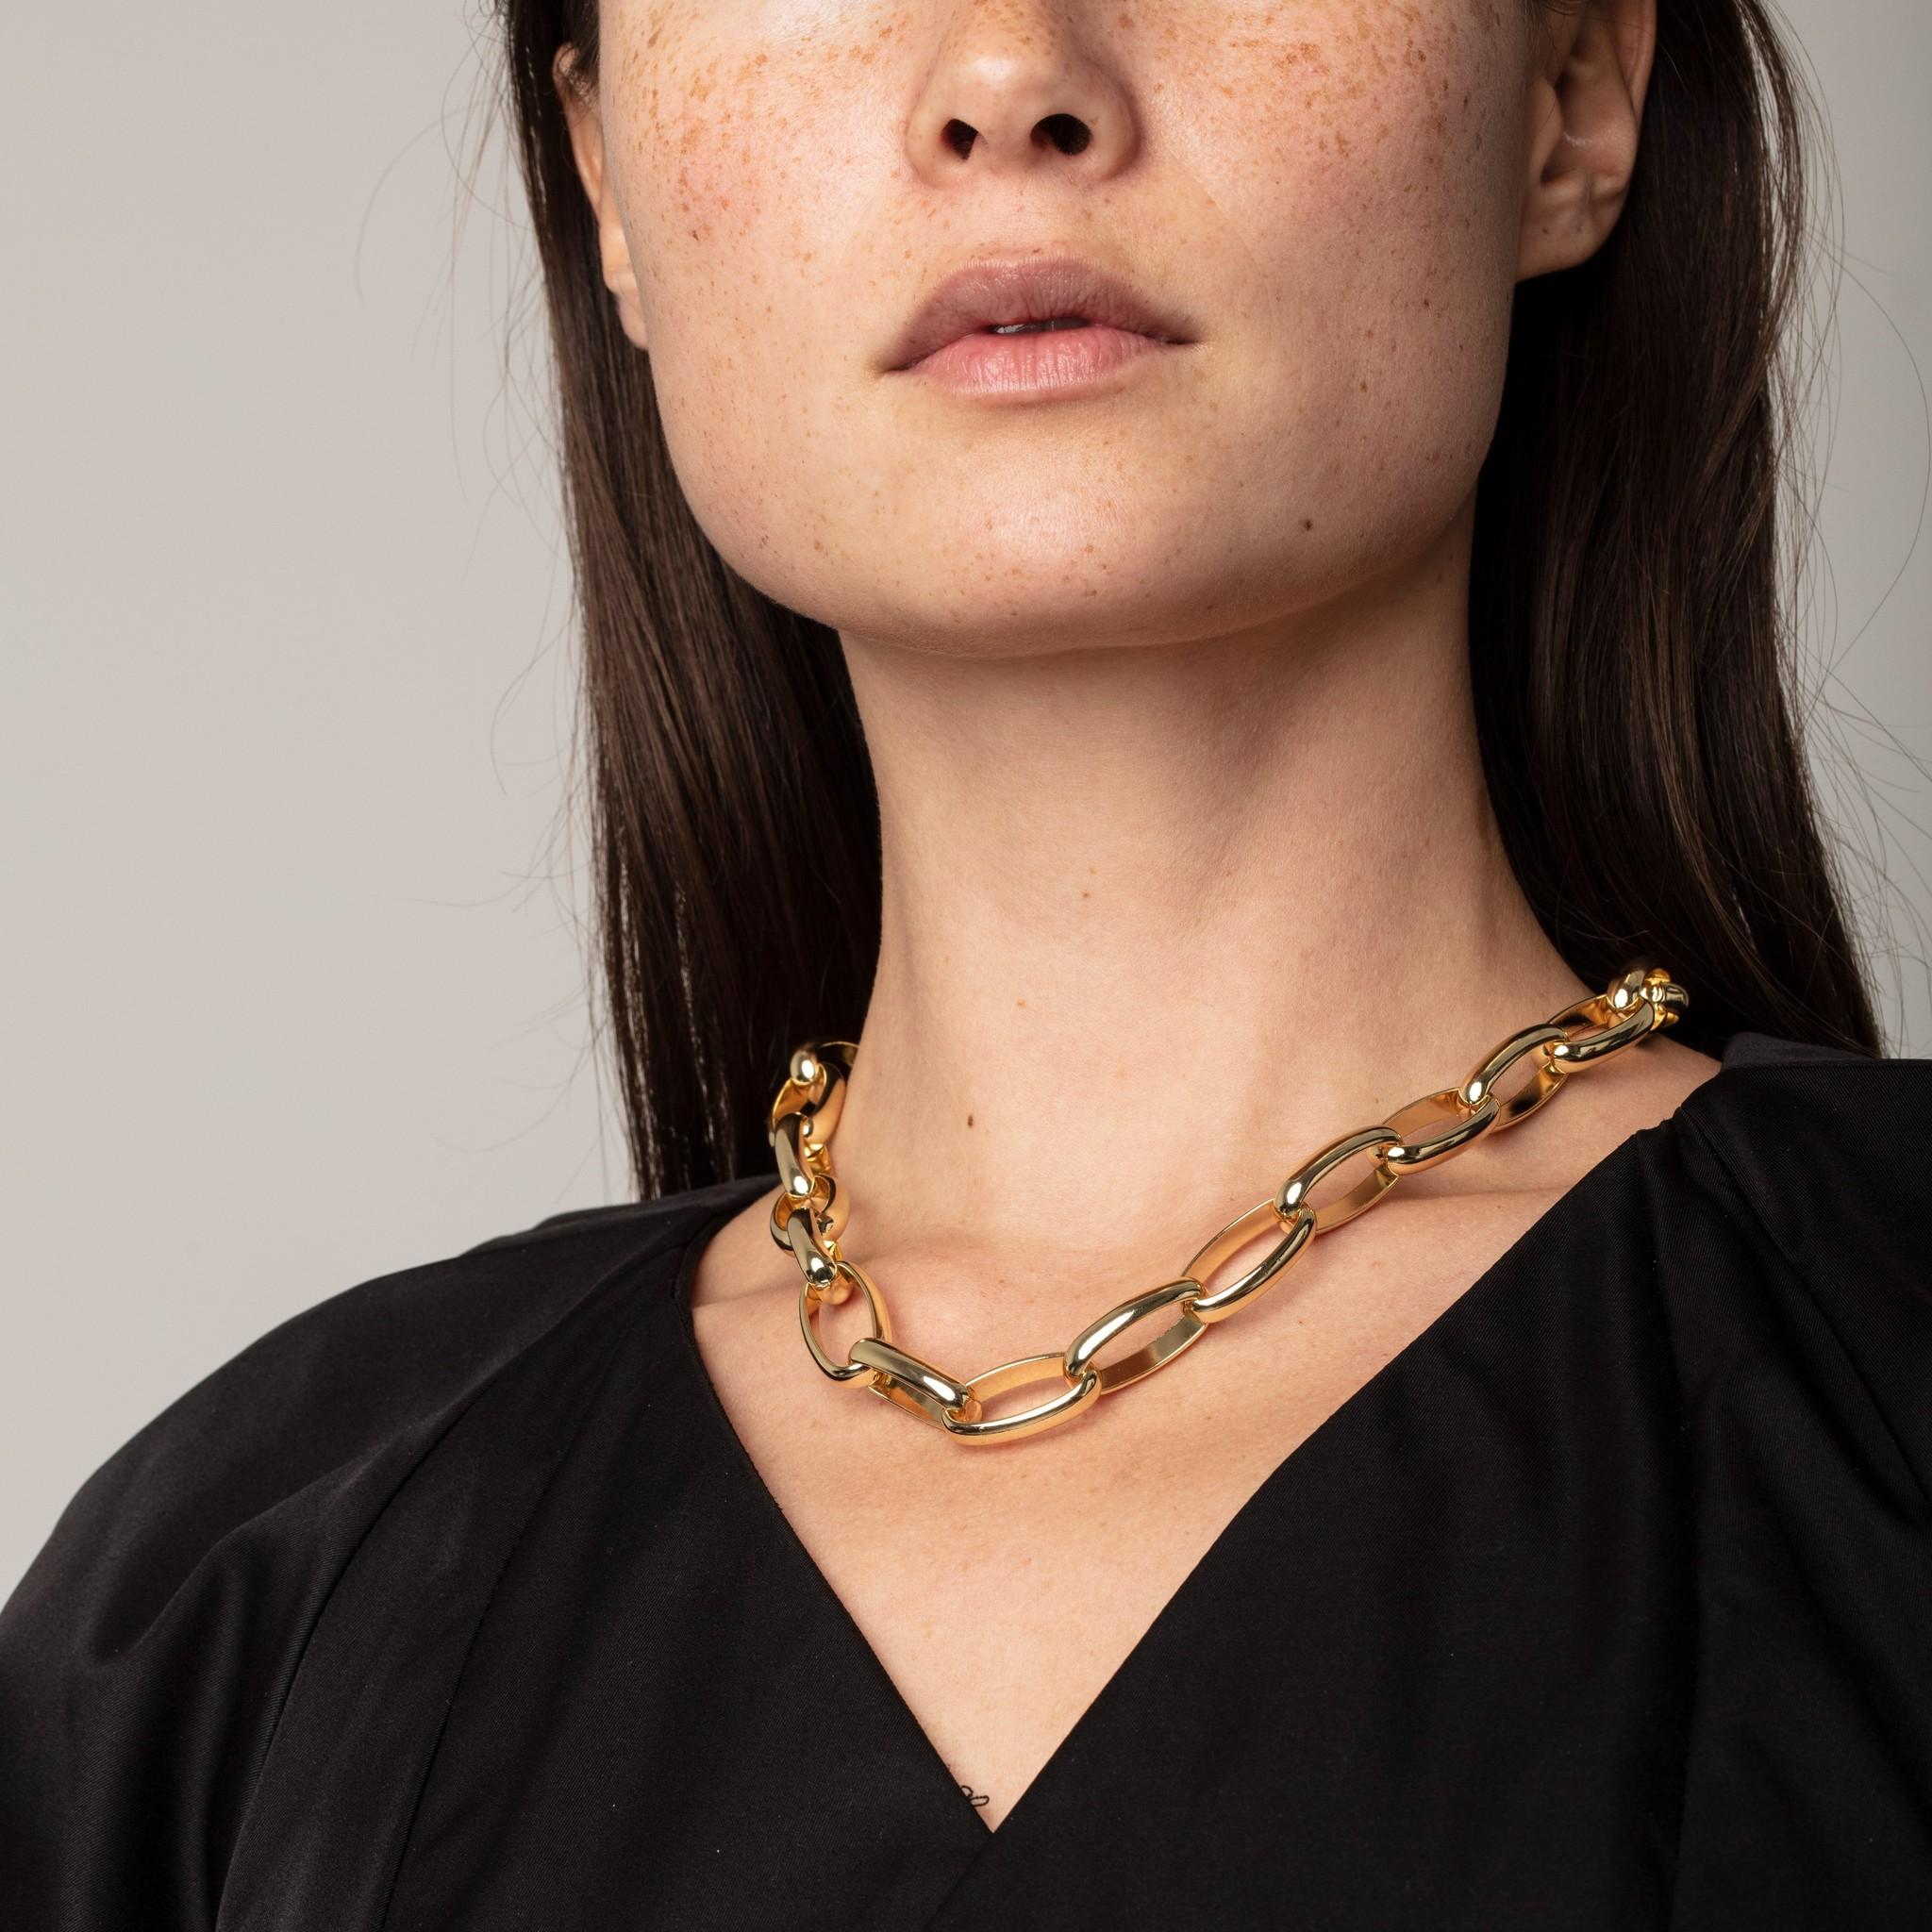 Pilgrim Pilgrim Rán Gold Chain Necklace